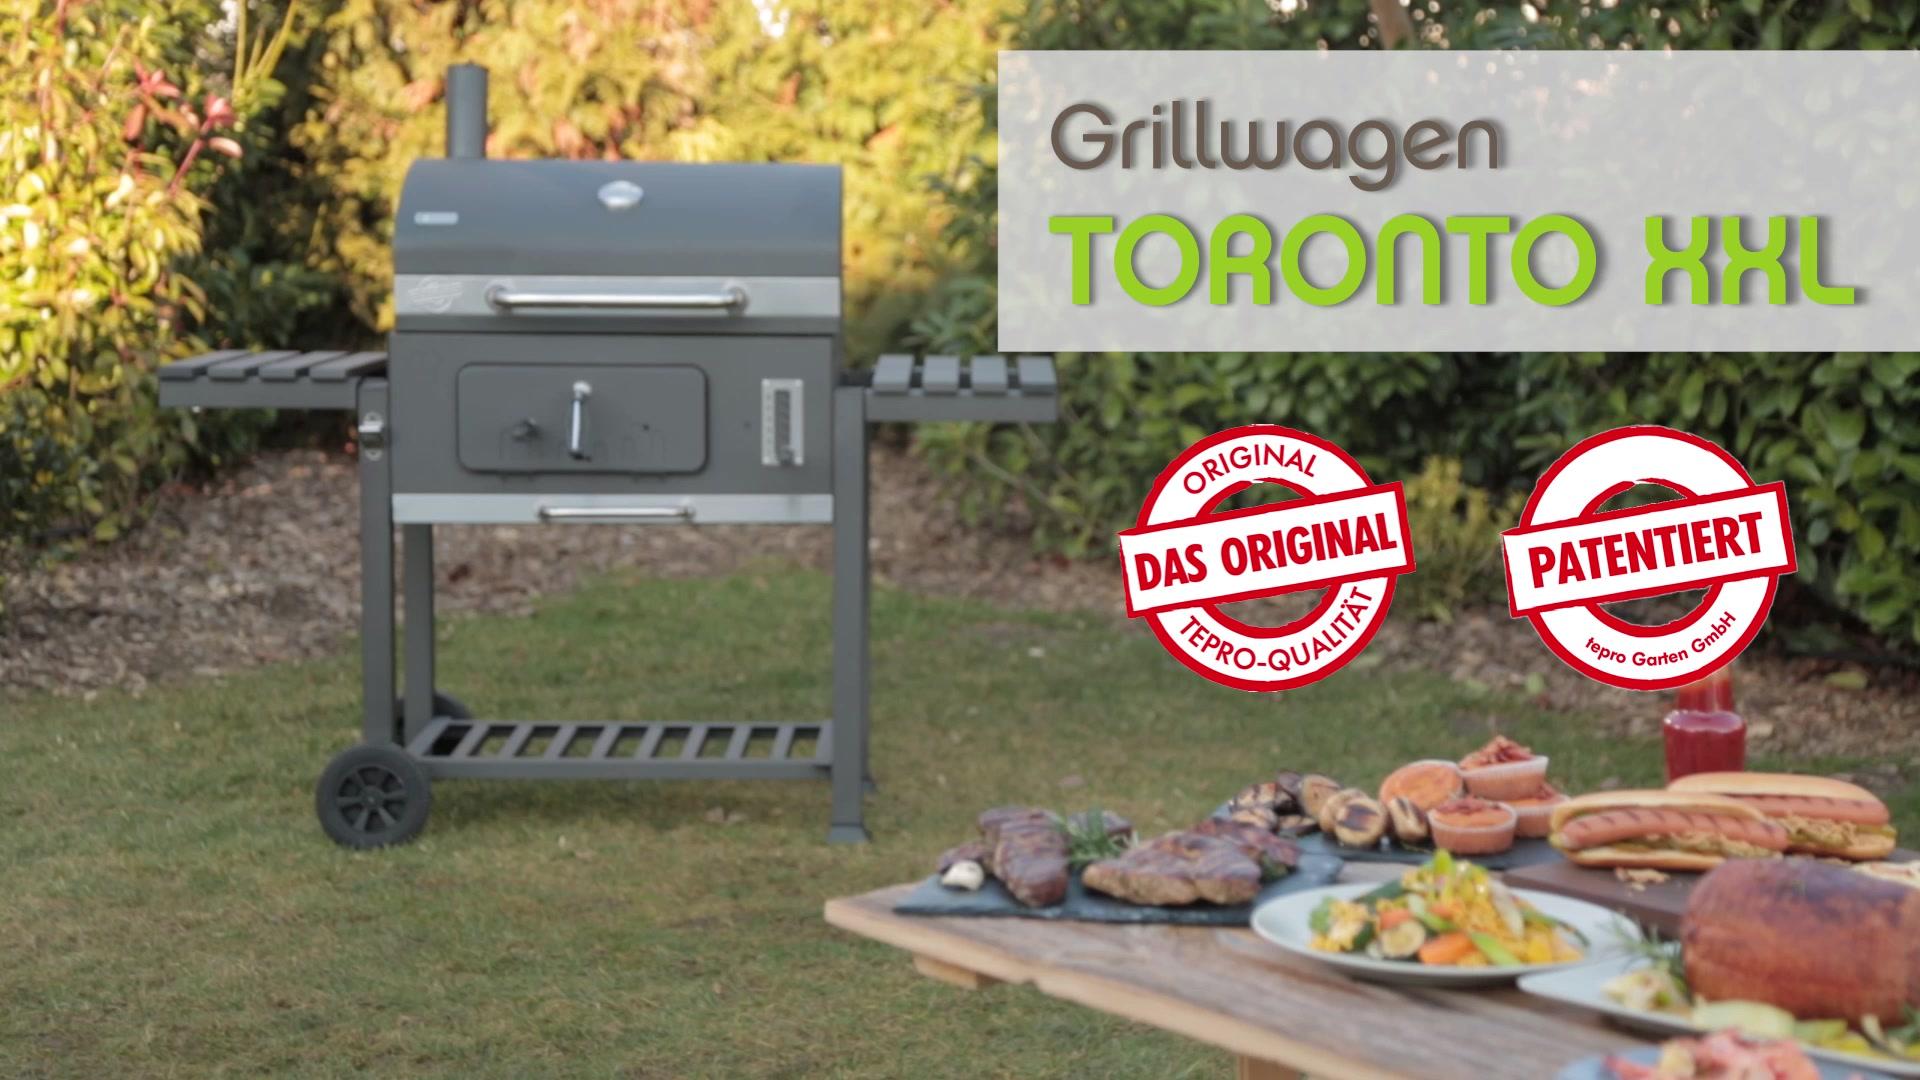 Tepro Holzkohlegrill Toronto Click Anleitung : Tepro grillwagen toronto xxl bei hornbach kaufen